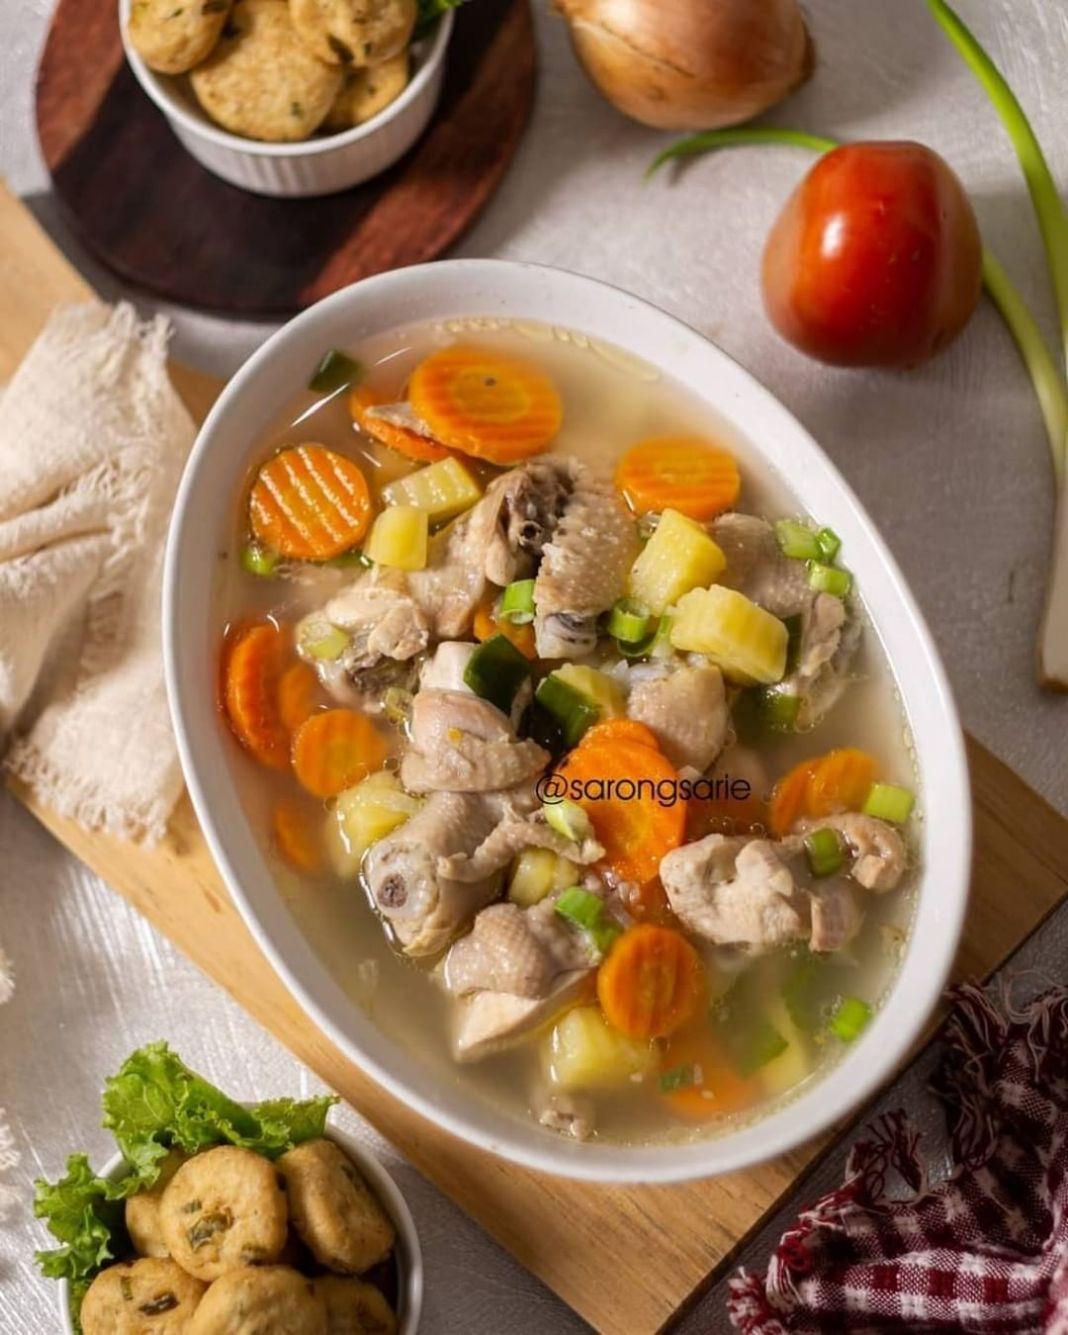 Info kuliner, seger bgt yah keliatannyaa   Terus bikin perkedel tahu, resep uda perna di share ya#ss_perkede…